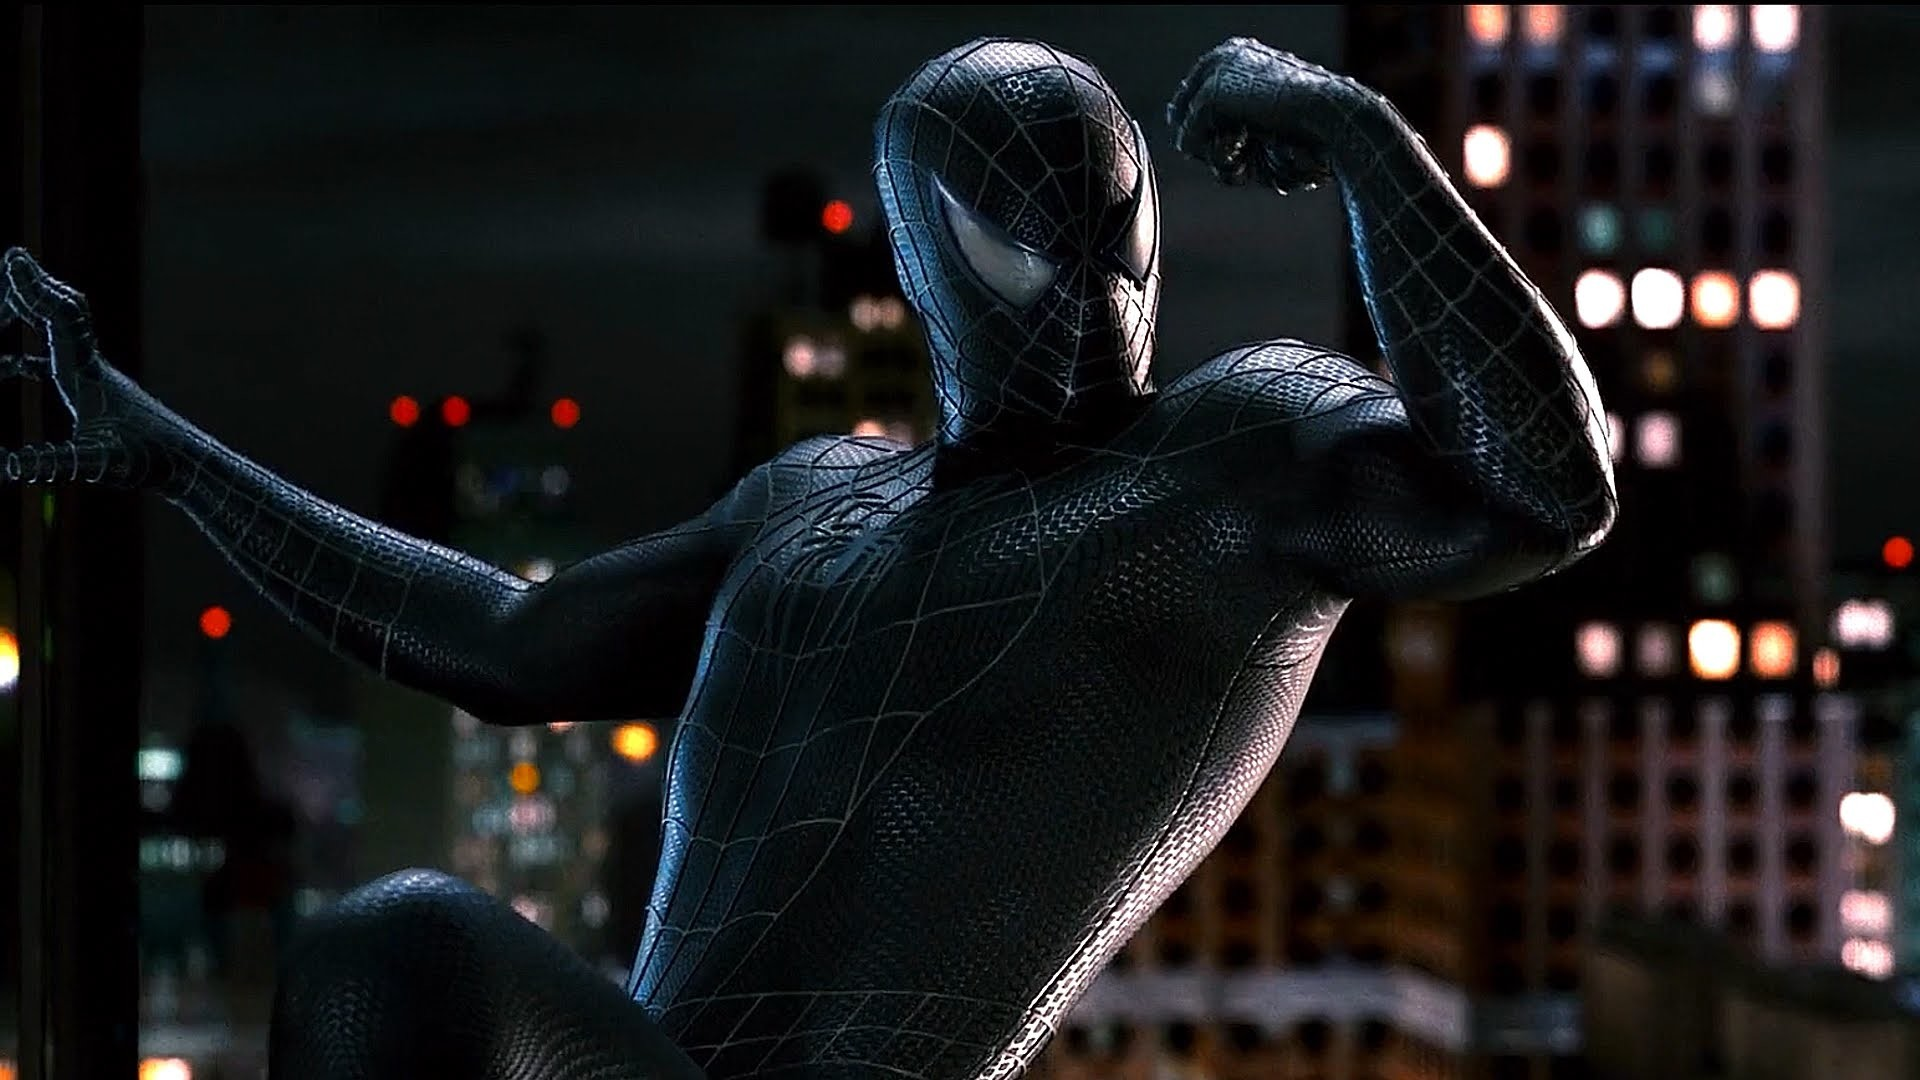 spiderman 3 ชื่ออังกฤษ : spider-man: homecoming, the amazing spider man 3 ชื่อไทย : ดิ อะเมซิ่ง สไปเดอร์แมน 3 ประเภท :action, adventure, fantasy, hd, master, zoom there are currently 4198 movies on our website.